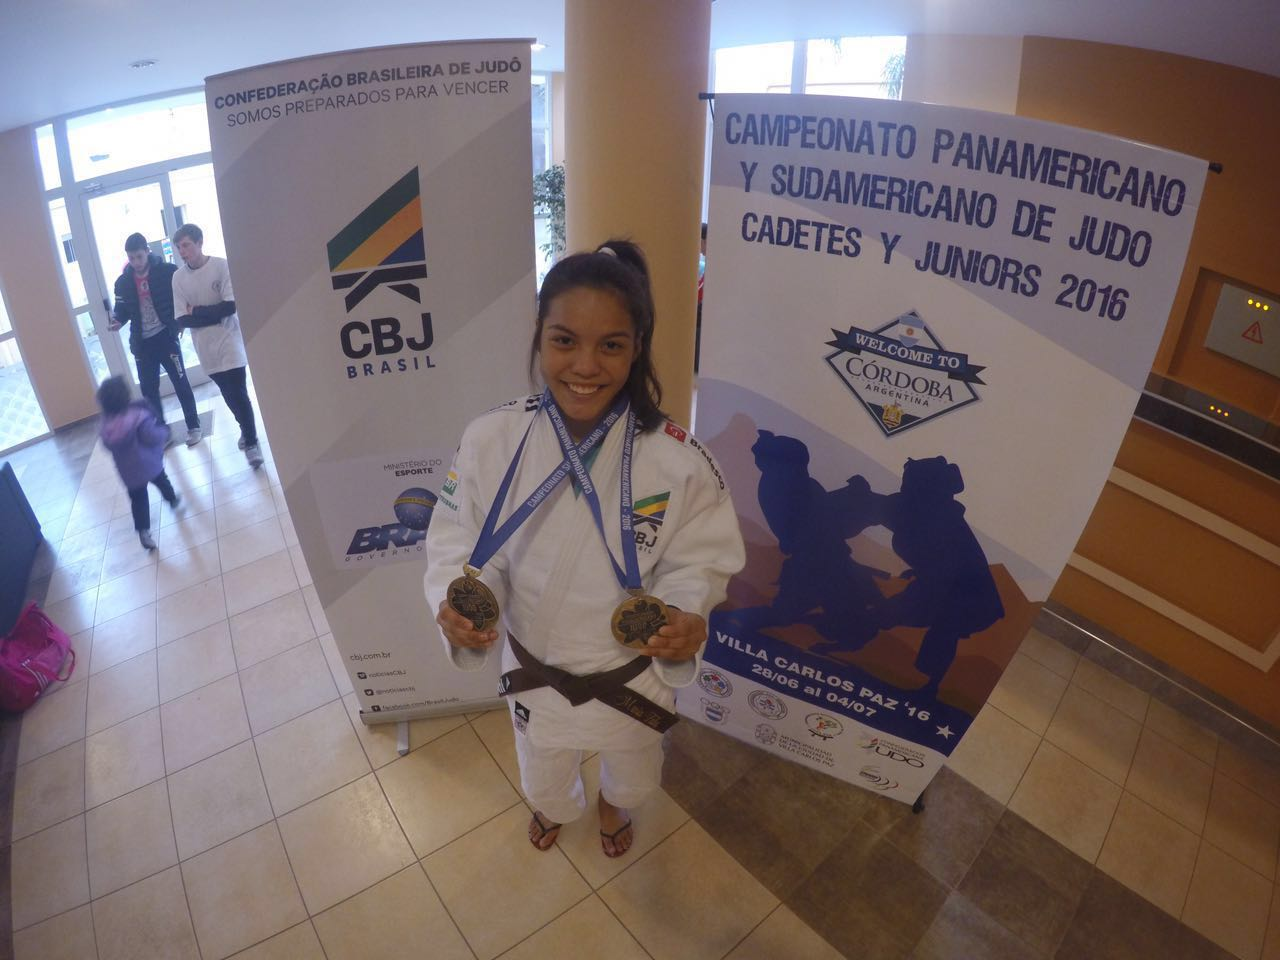 Mariataba_alunafinalistacdb_manaus_campeasulameticana_contraargentina_na_argentina_03072016